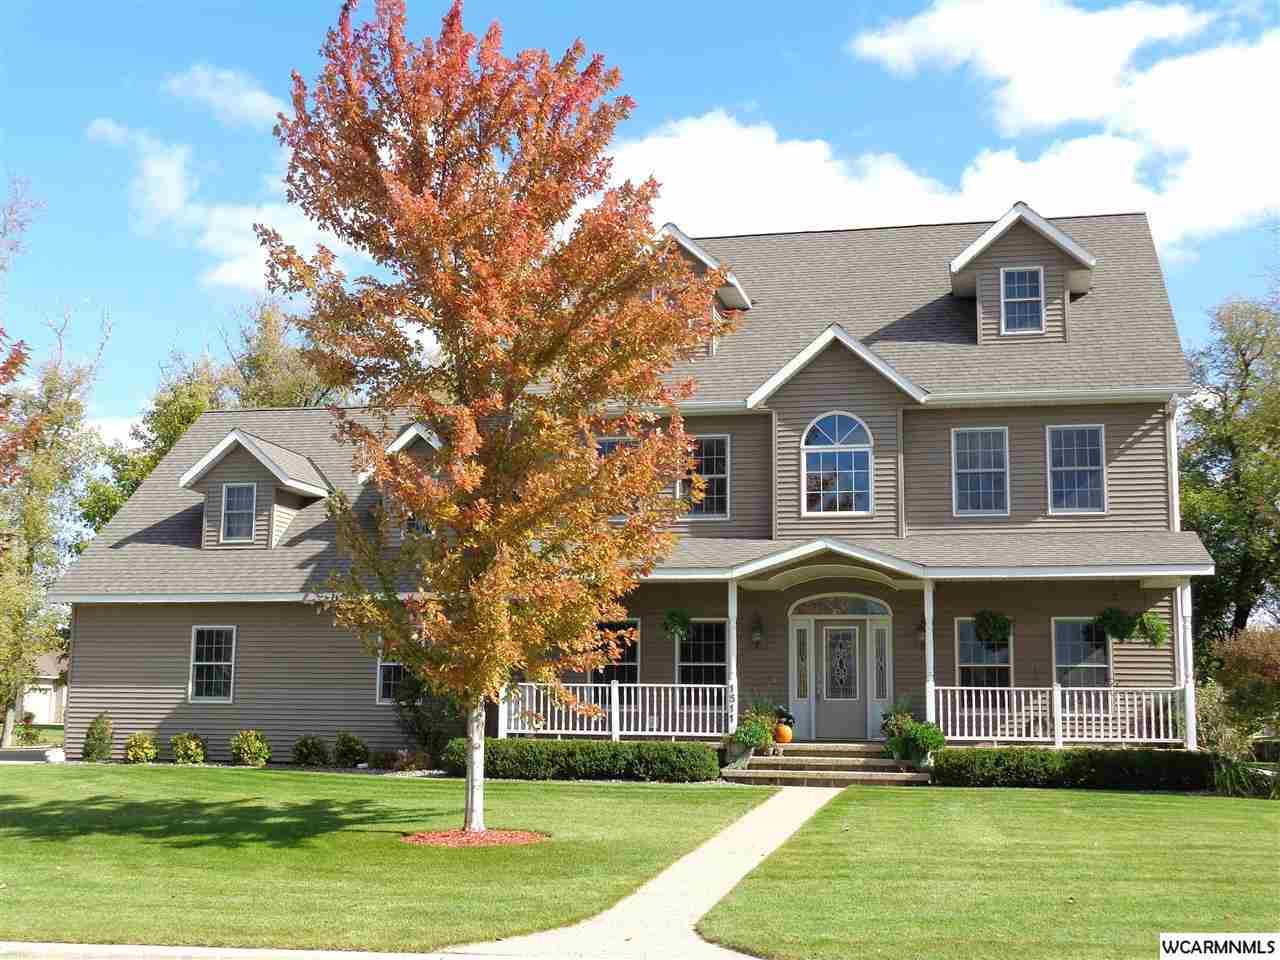 Real Estate for Sale, ListingId: 31780446, Willmar,MN56201